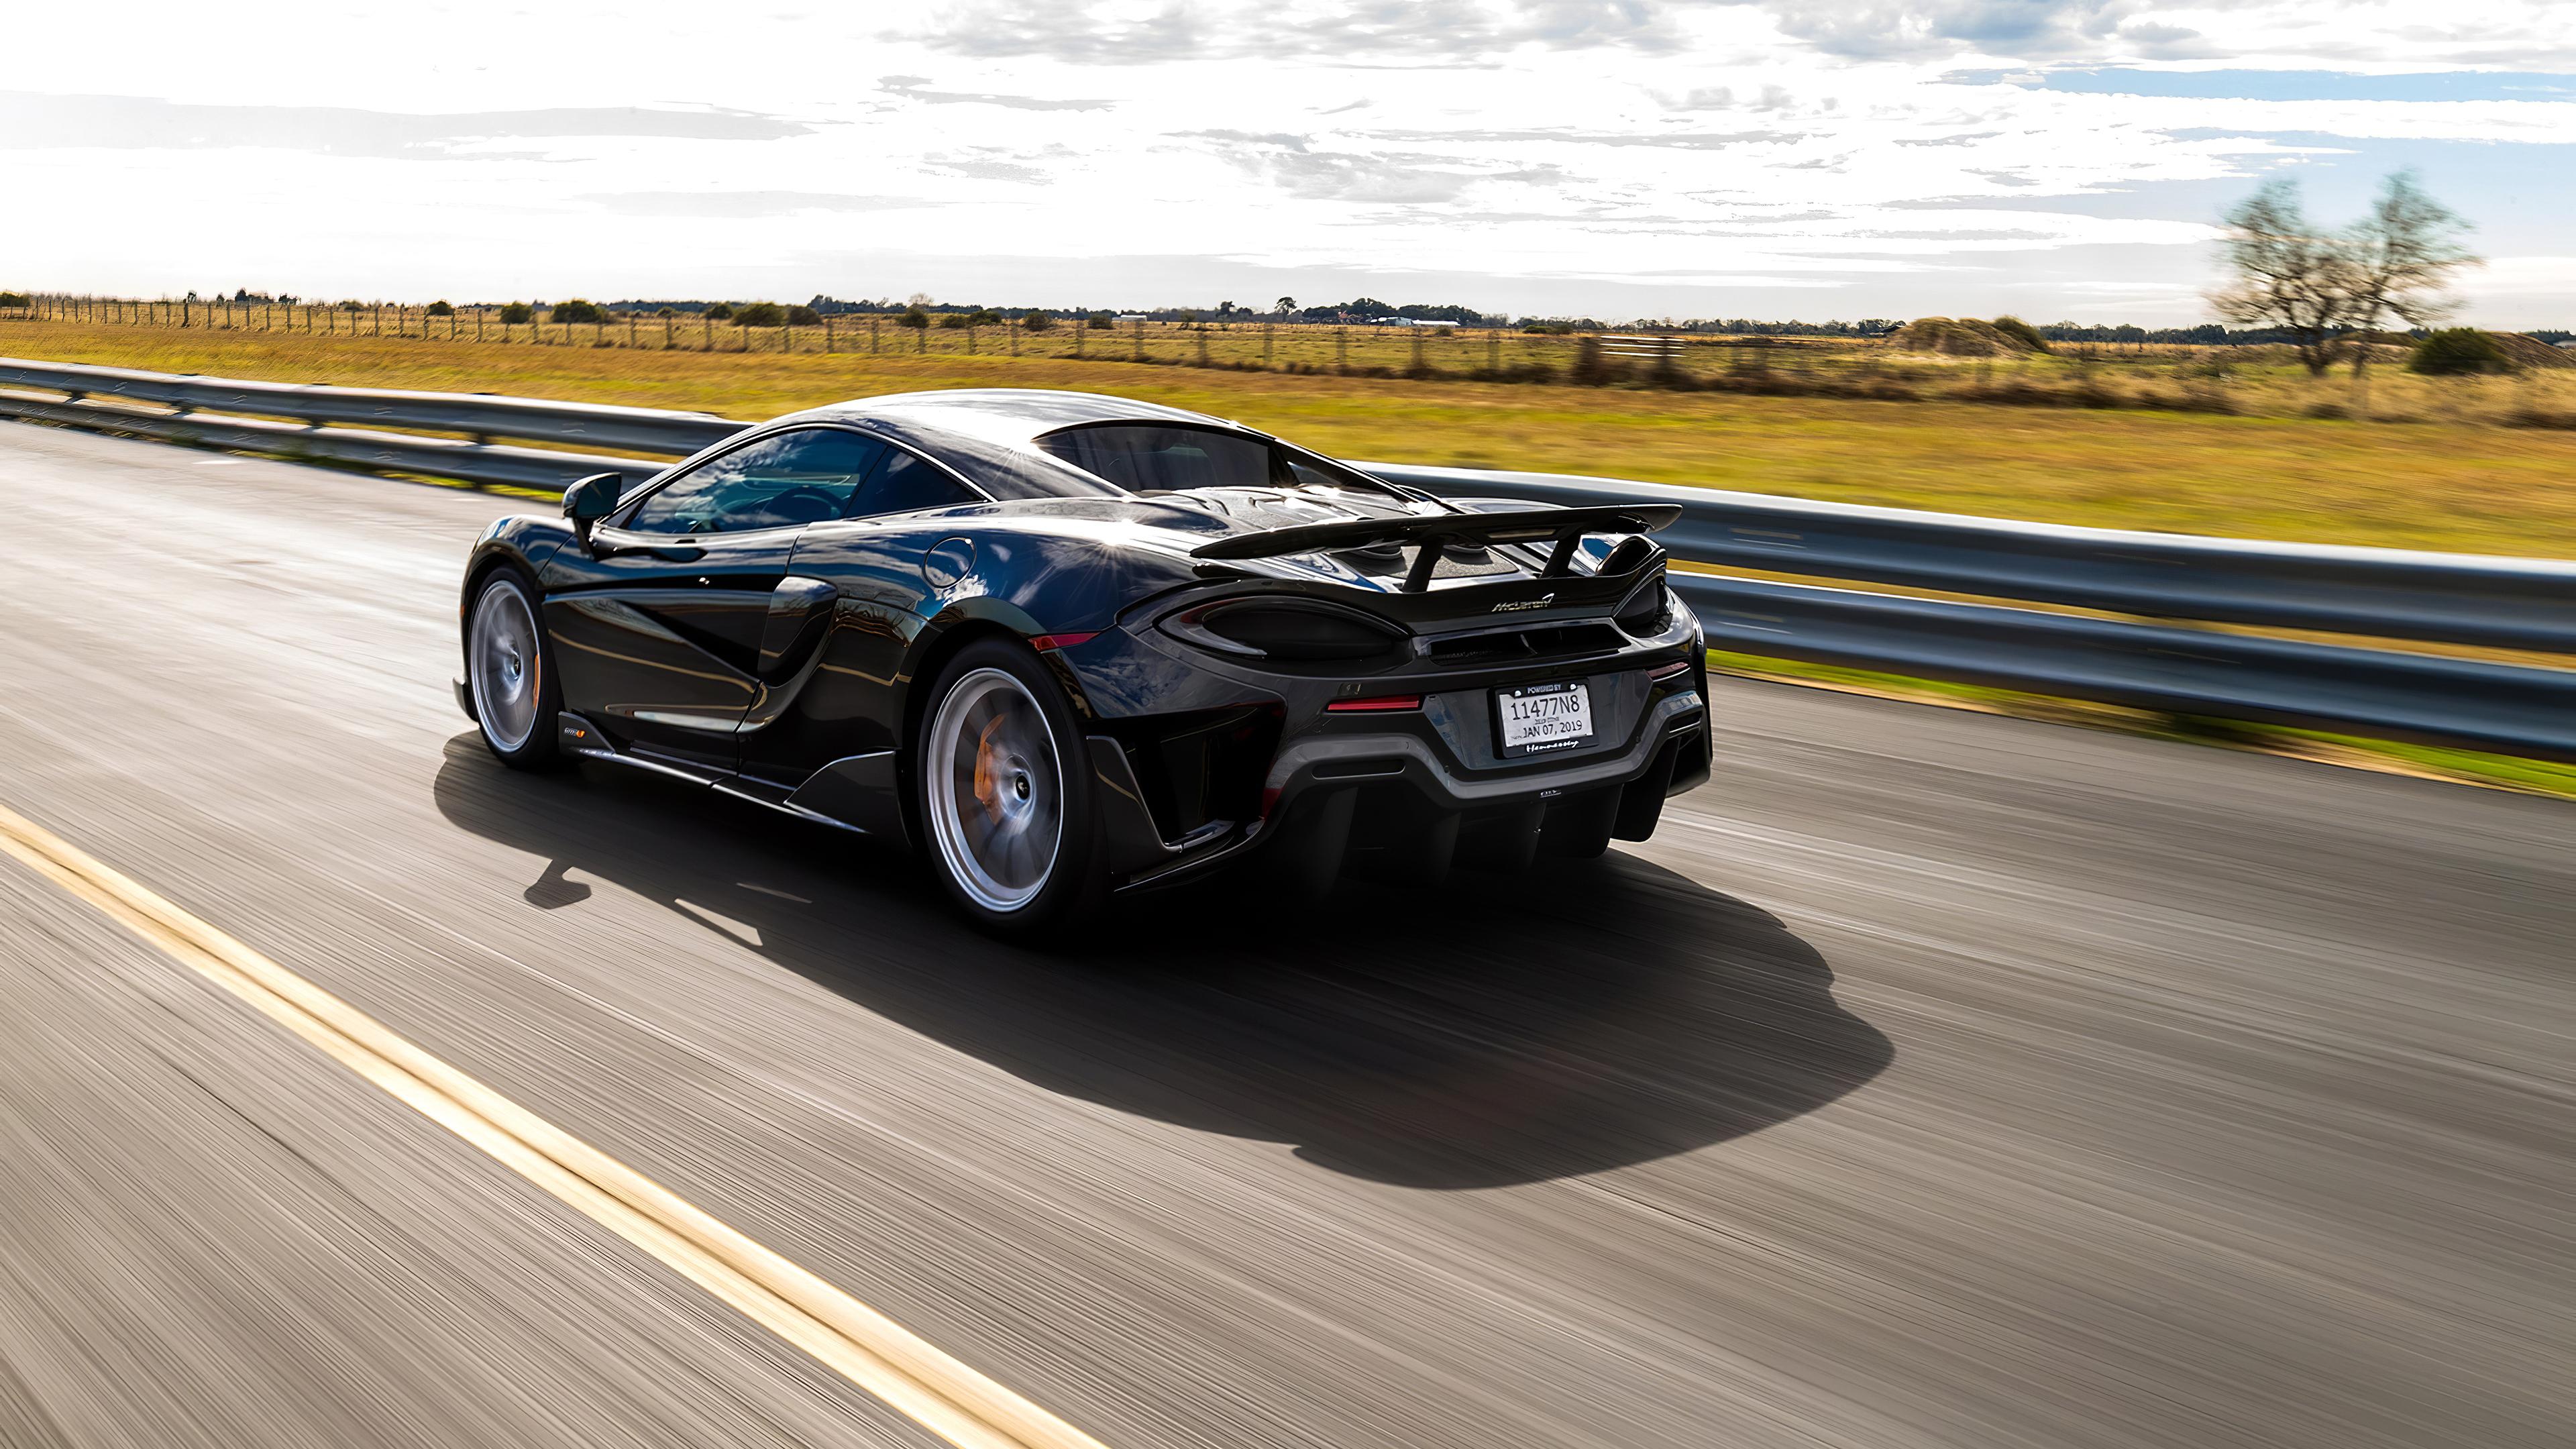 hennessey mclaren 600lt hpe800 1572661030 - Hennessey McLaren 600LT HPE800 - mclaren wallpapers, mclaren 600lt wallpapers, hd-wallpapers, cars wallpapers, 4k-wallpapers, 2020 cars wallpapers